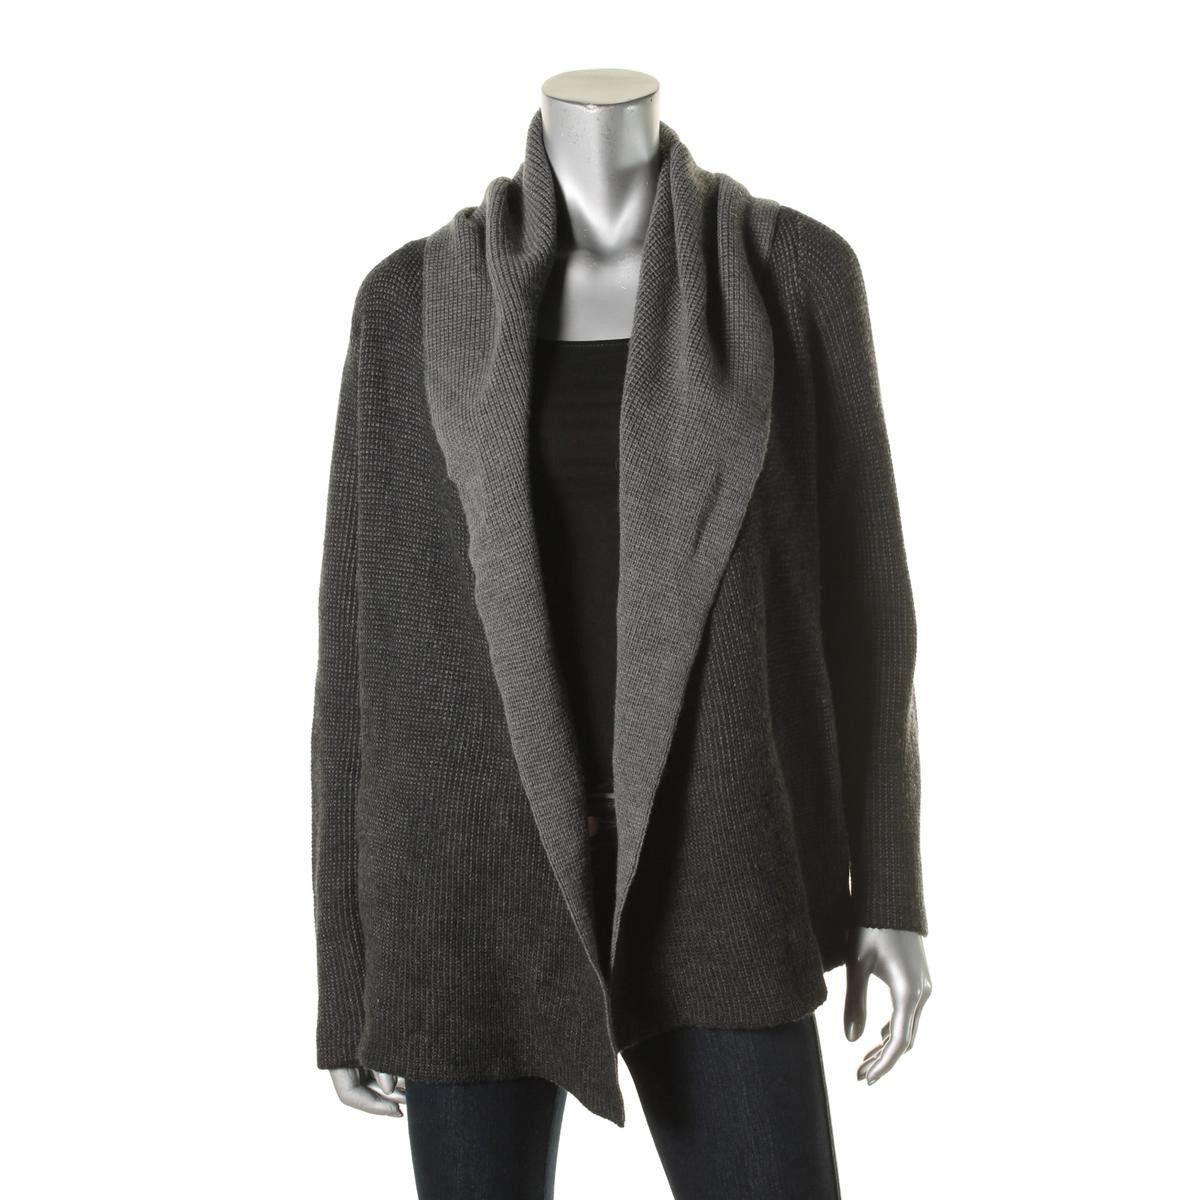 Womens Petites Merino Wool Hooded Cardigan Sweater | Eileen fisher ...